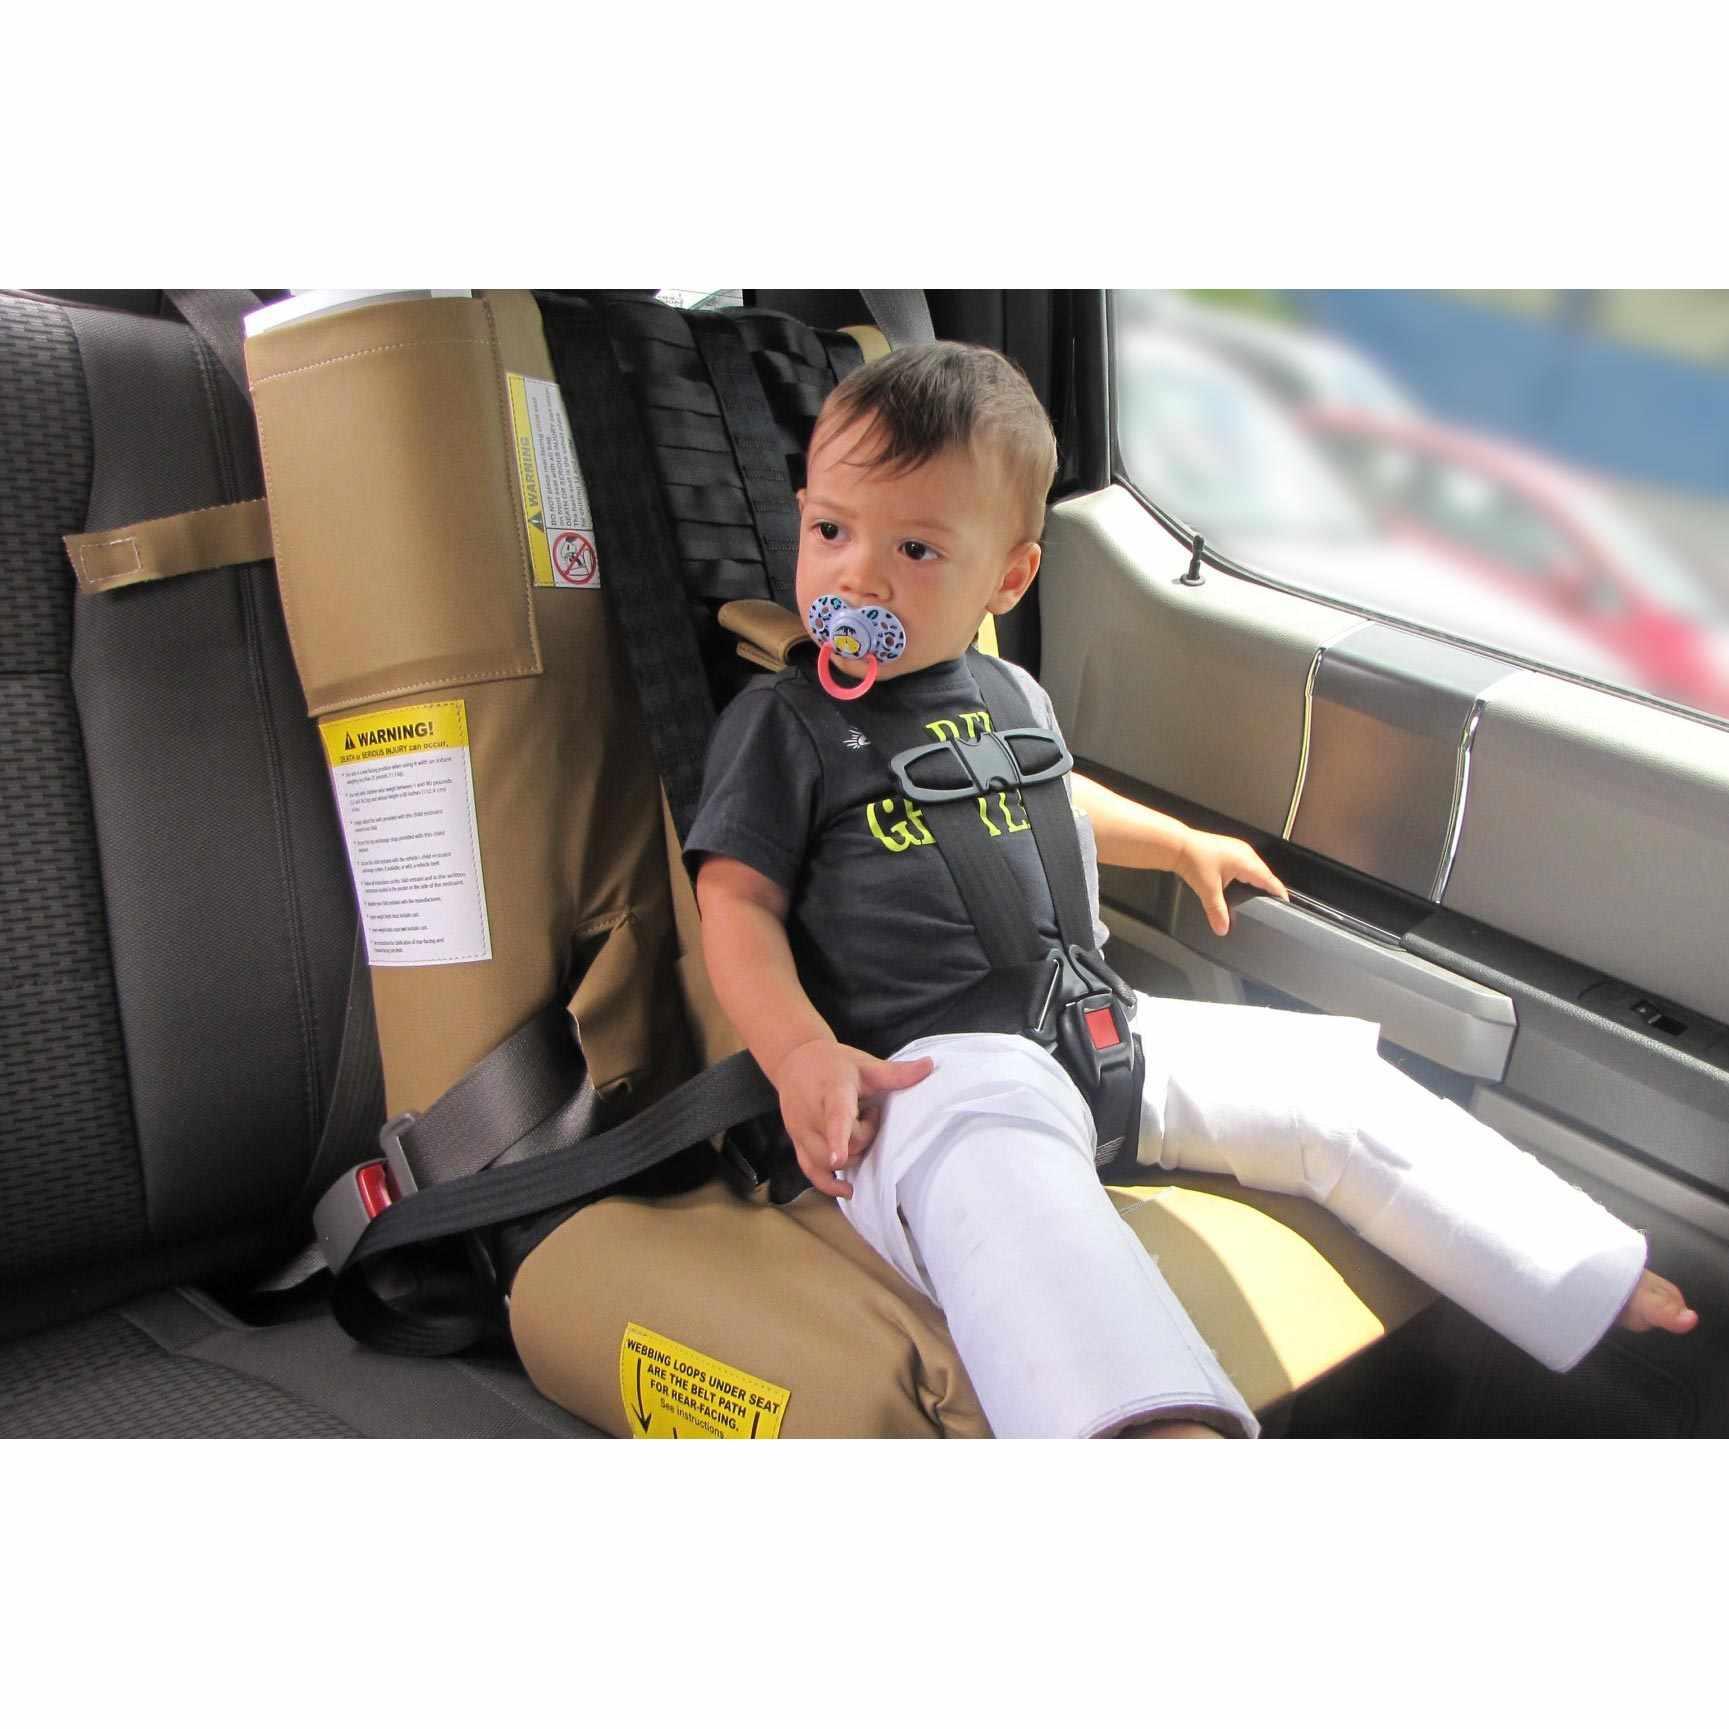 Wallenberg Hip Cast Car Seat